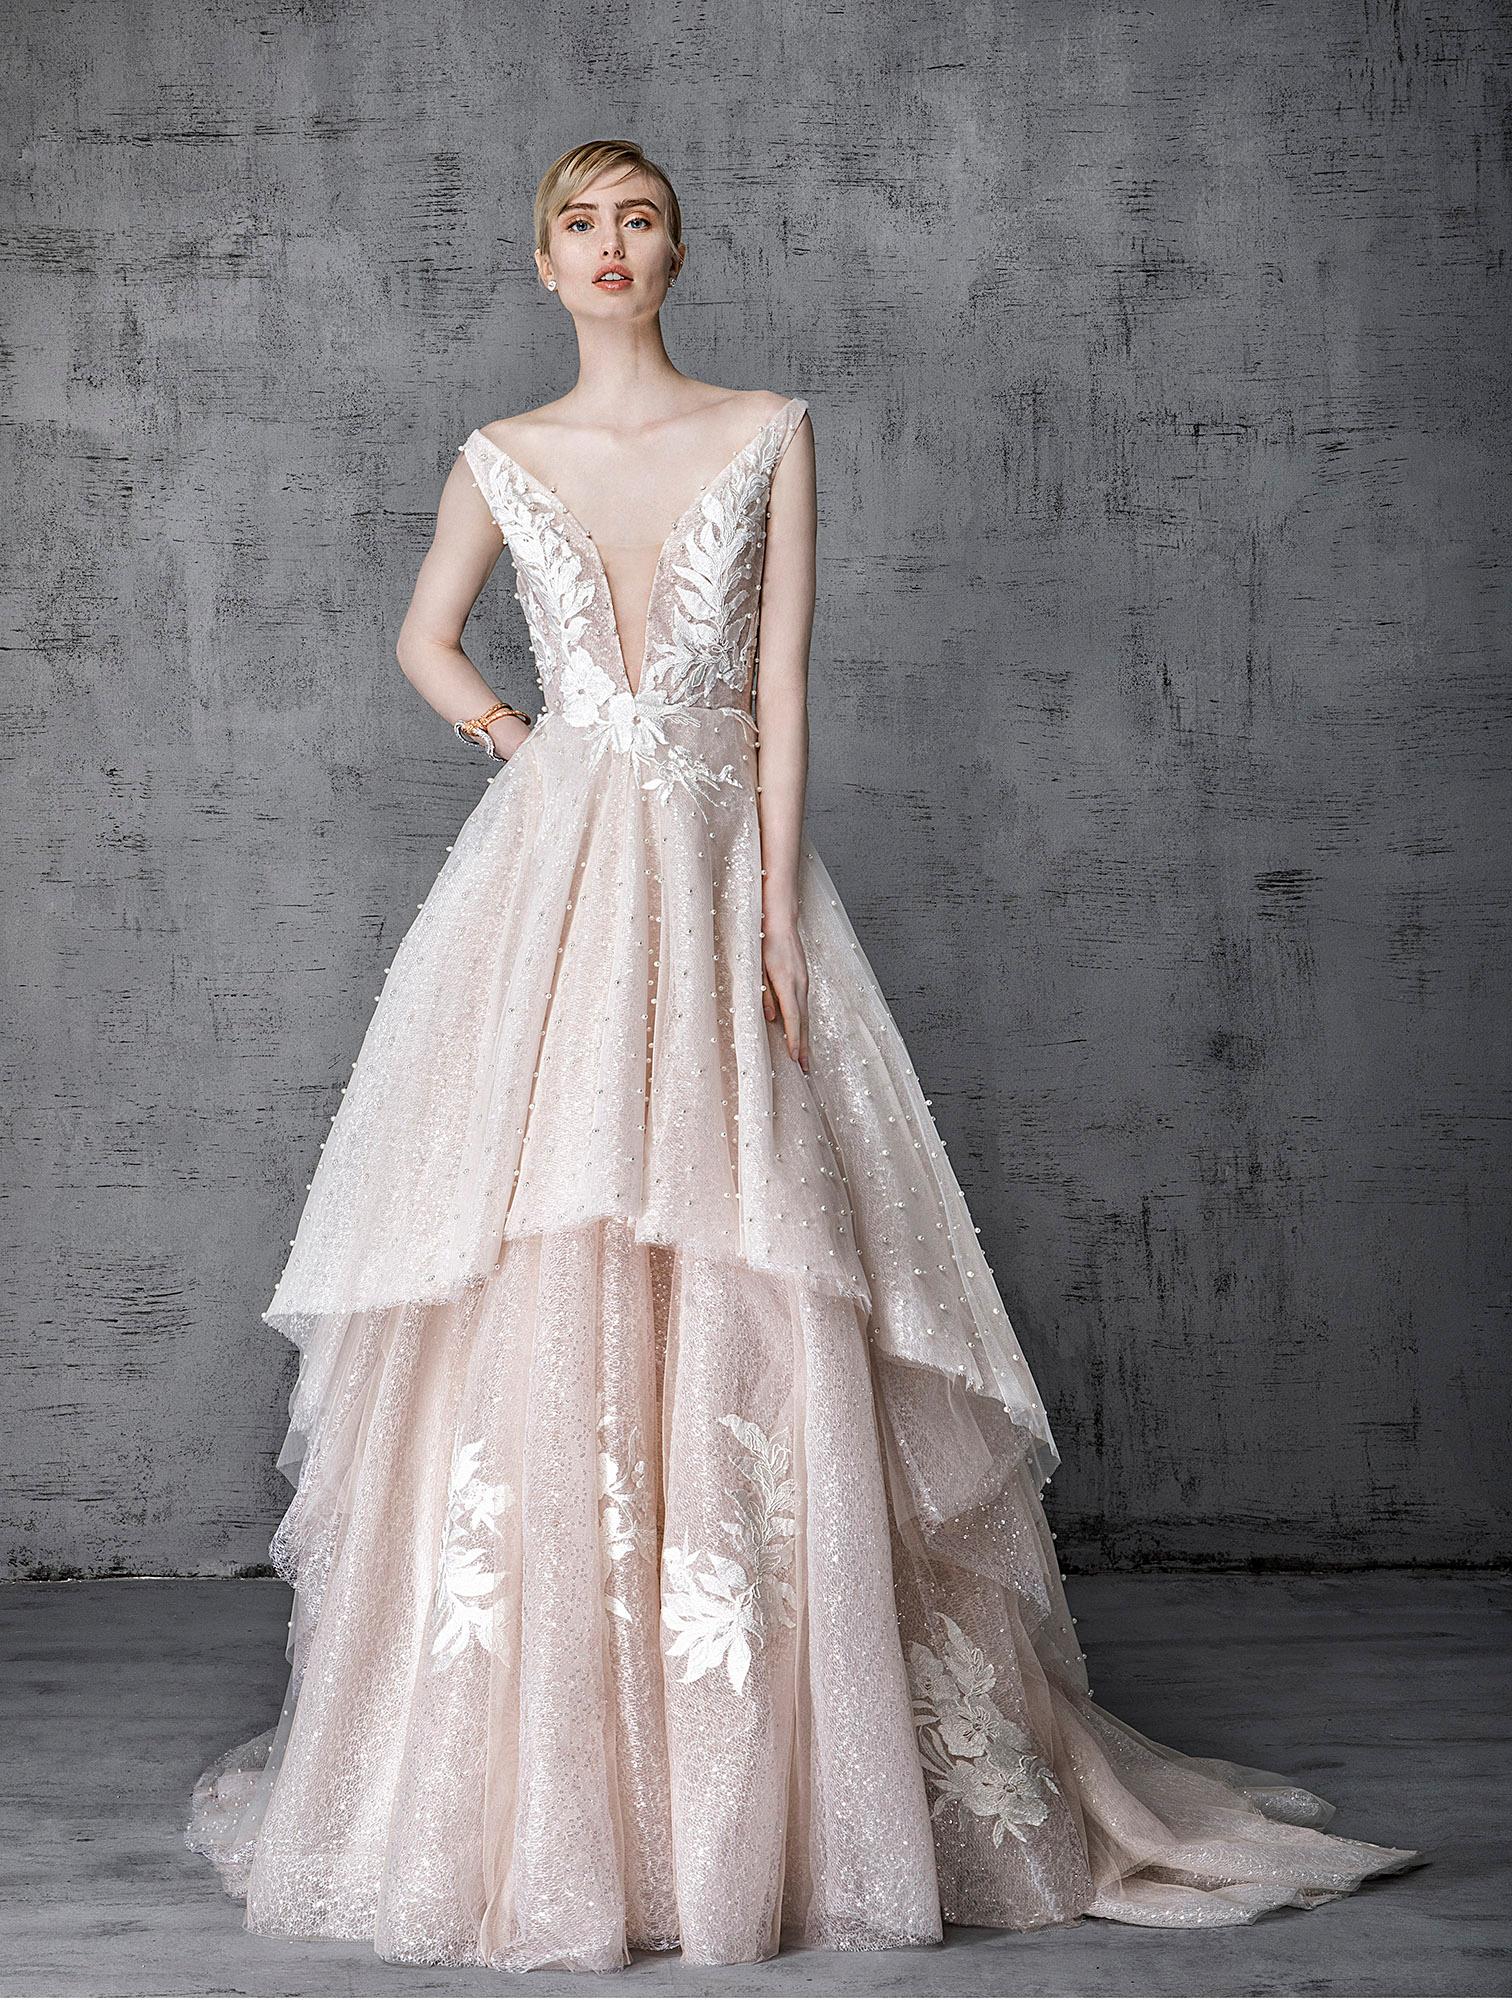 victoria kyriakides wedding dress spring 2019 blush plunging neck tiered skirt